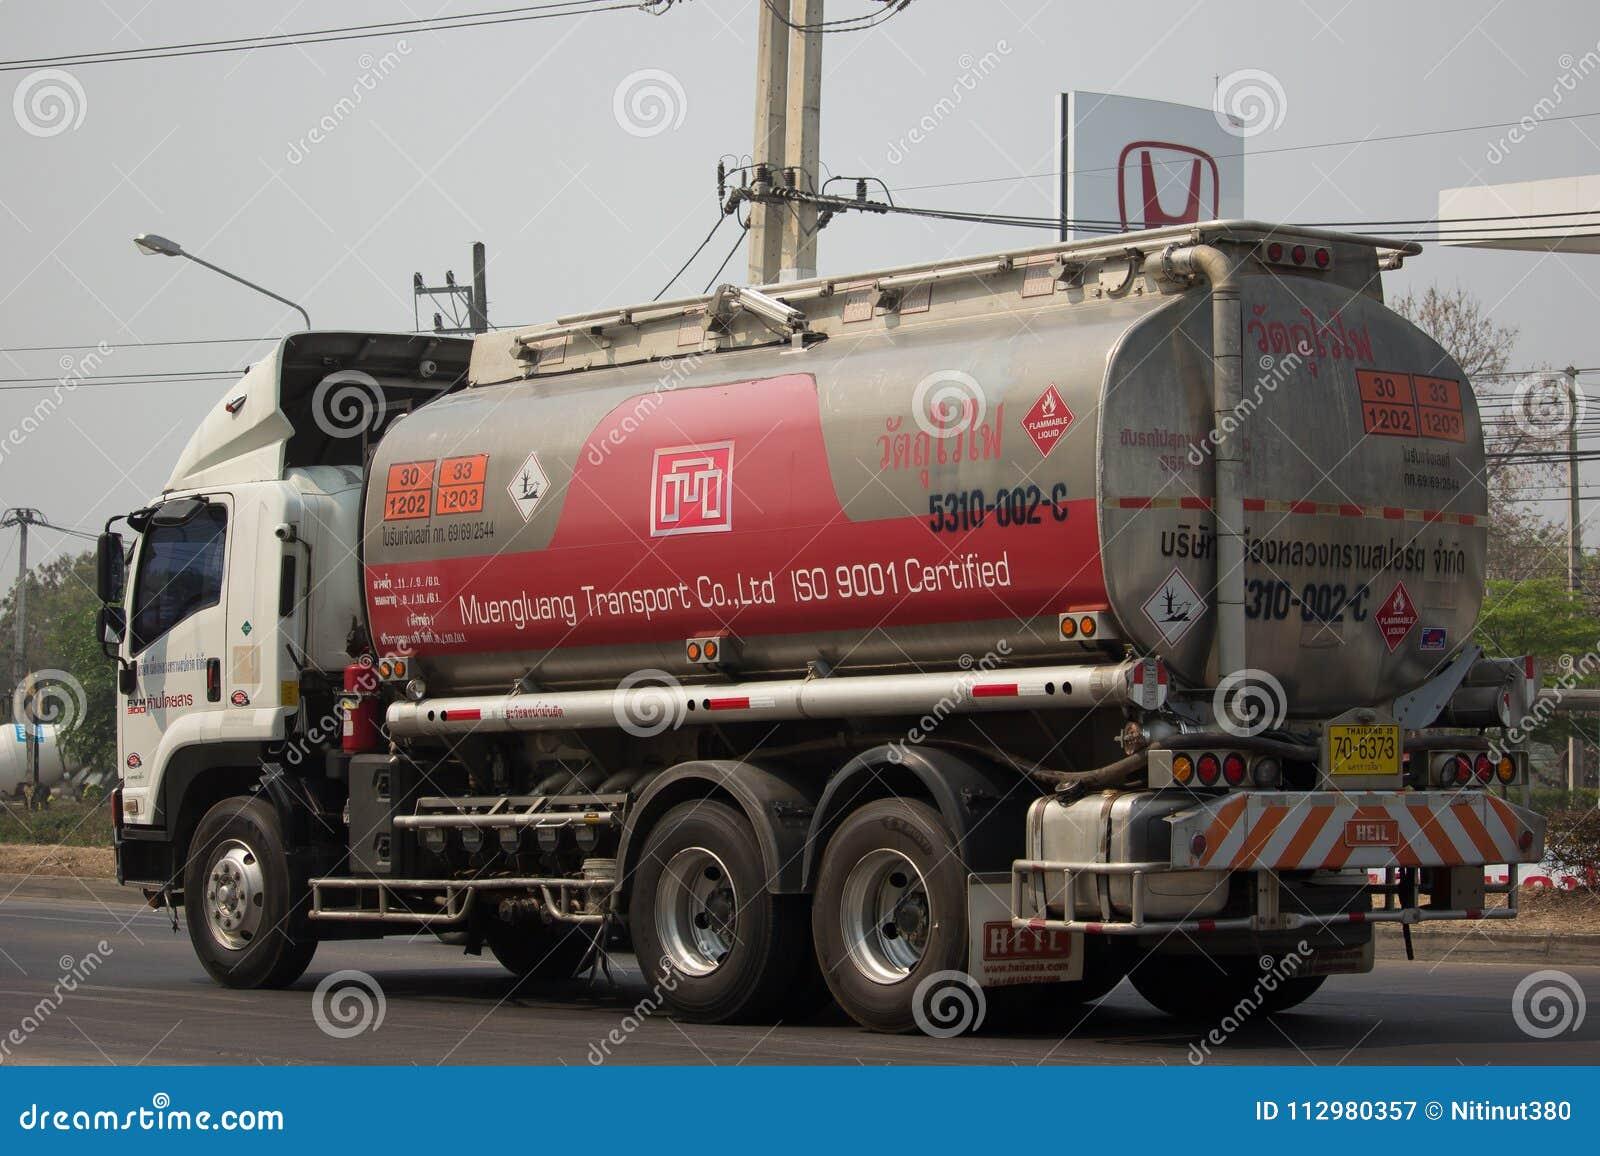 Oil Truck of MeungLuang Oil transport Company.